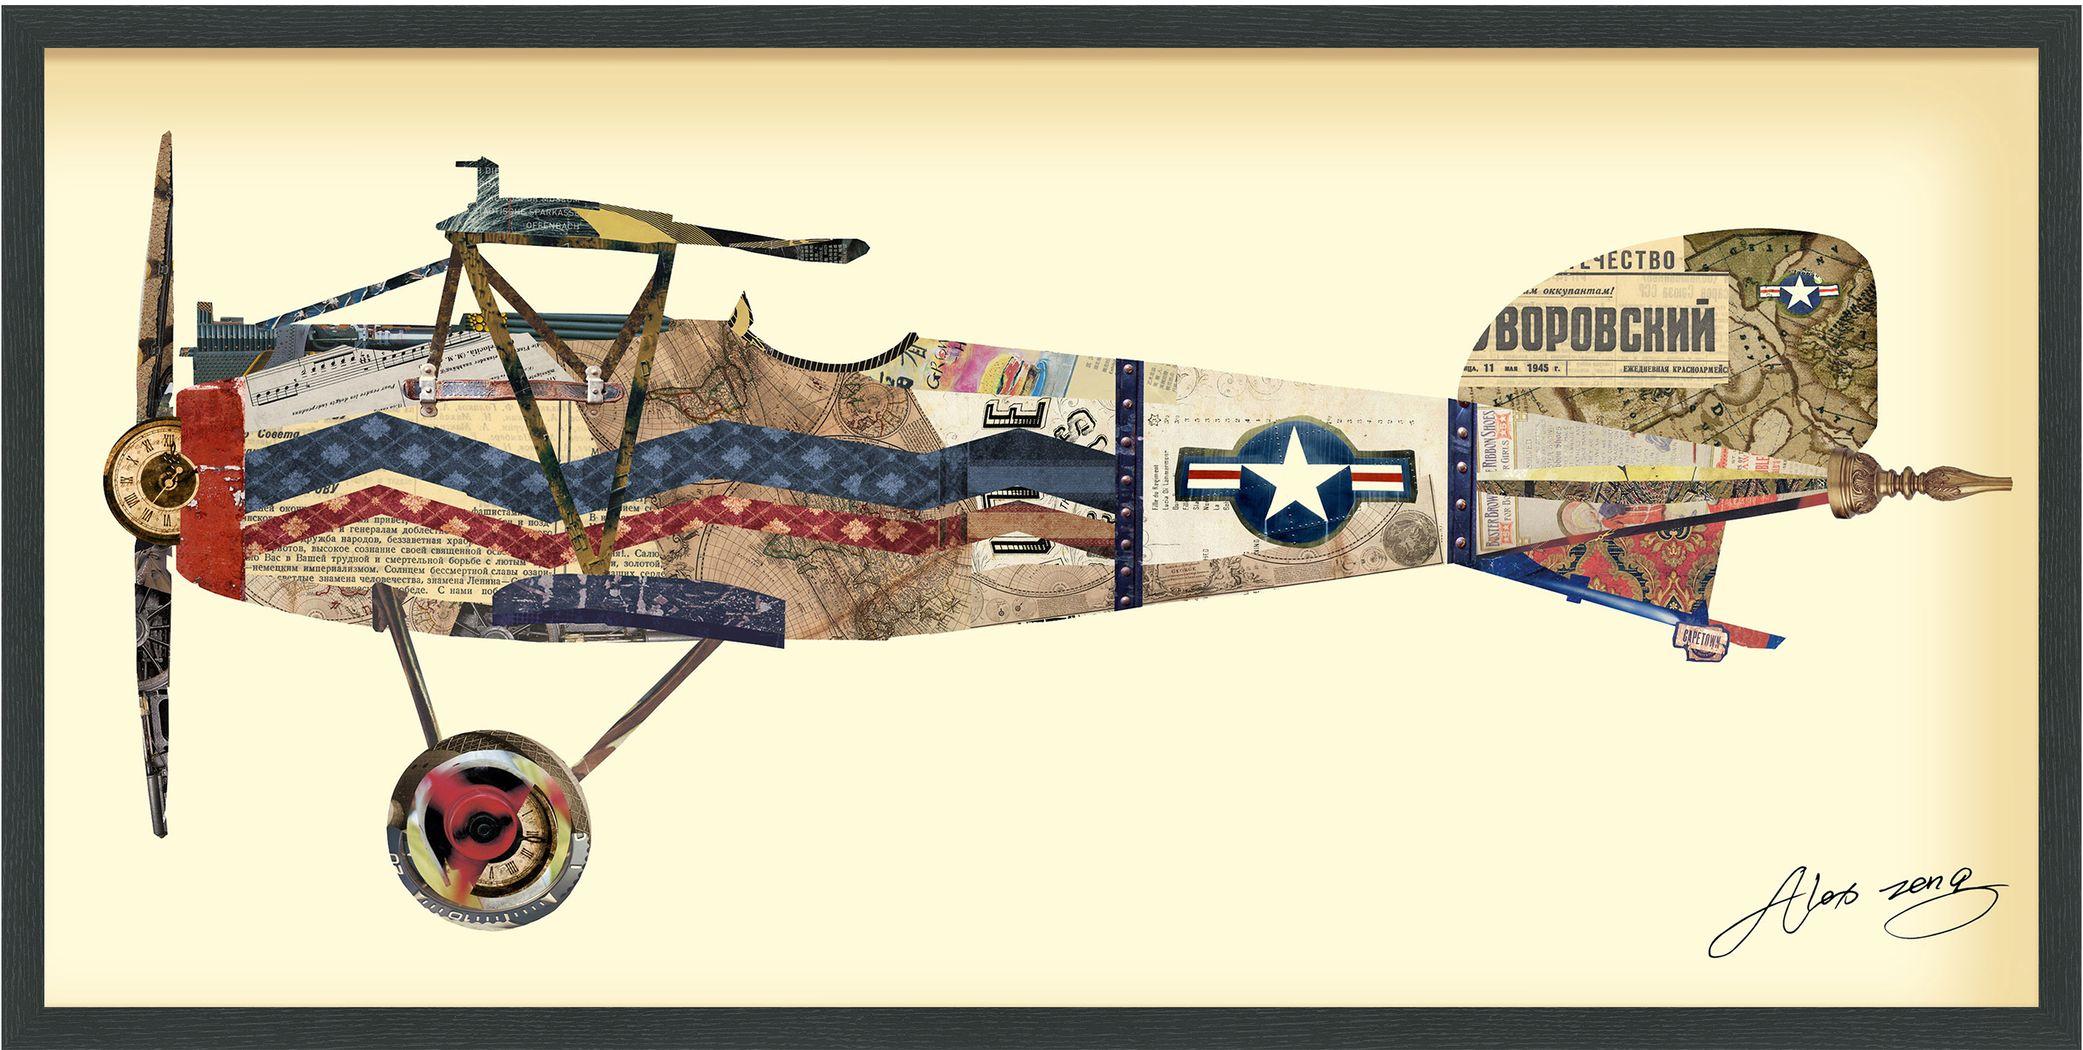 Camdyn Biplane Artwork